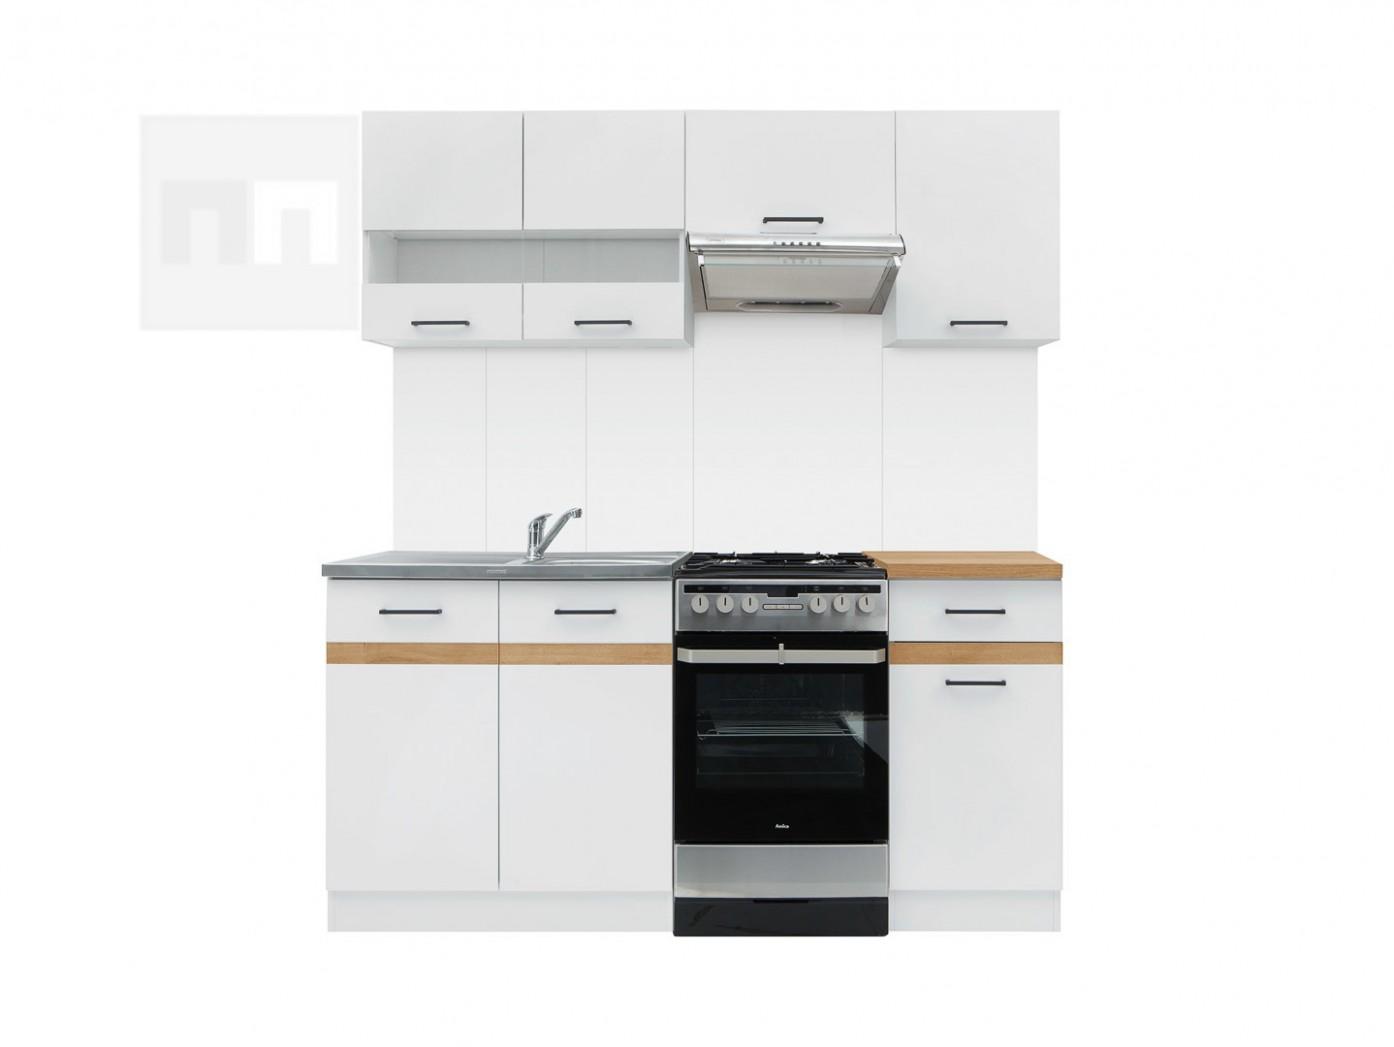 Kuchyňská linka 44 cm v kombinaci bílý lesk a dub zlatý W44 ...